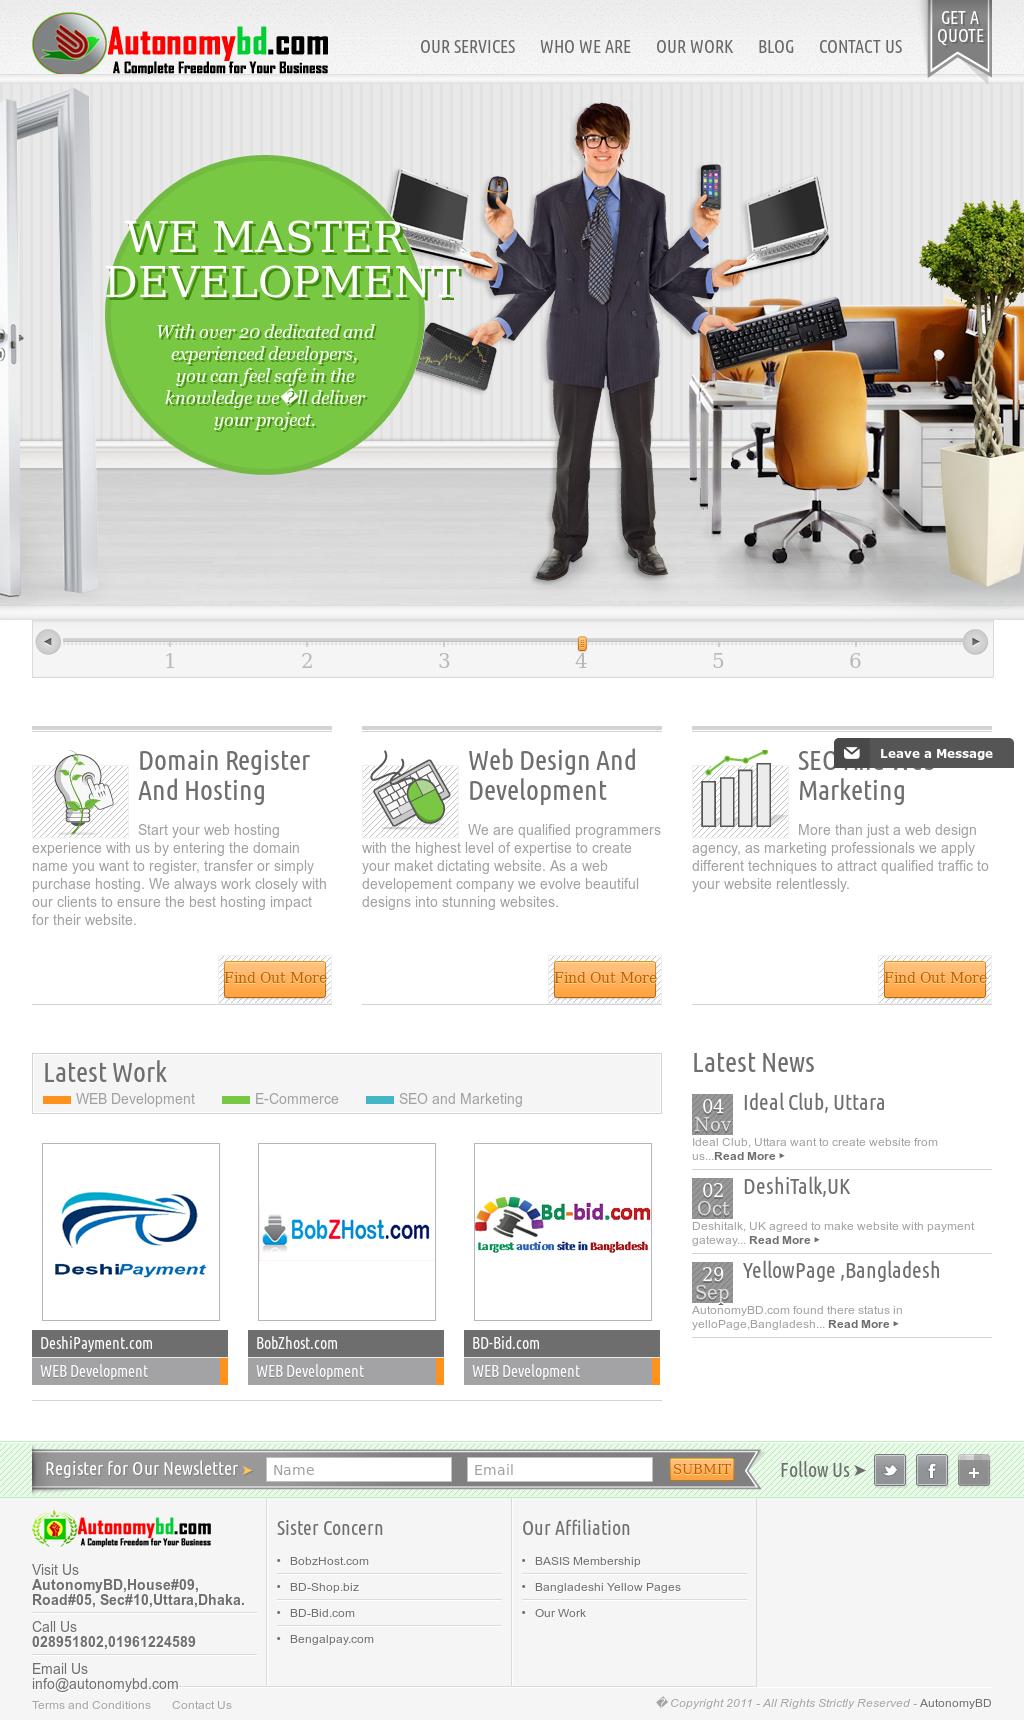 Autonomy Bd Competitors, Revenue and Employees - Owler Company Profile